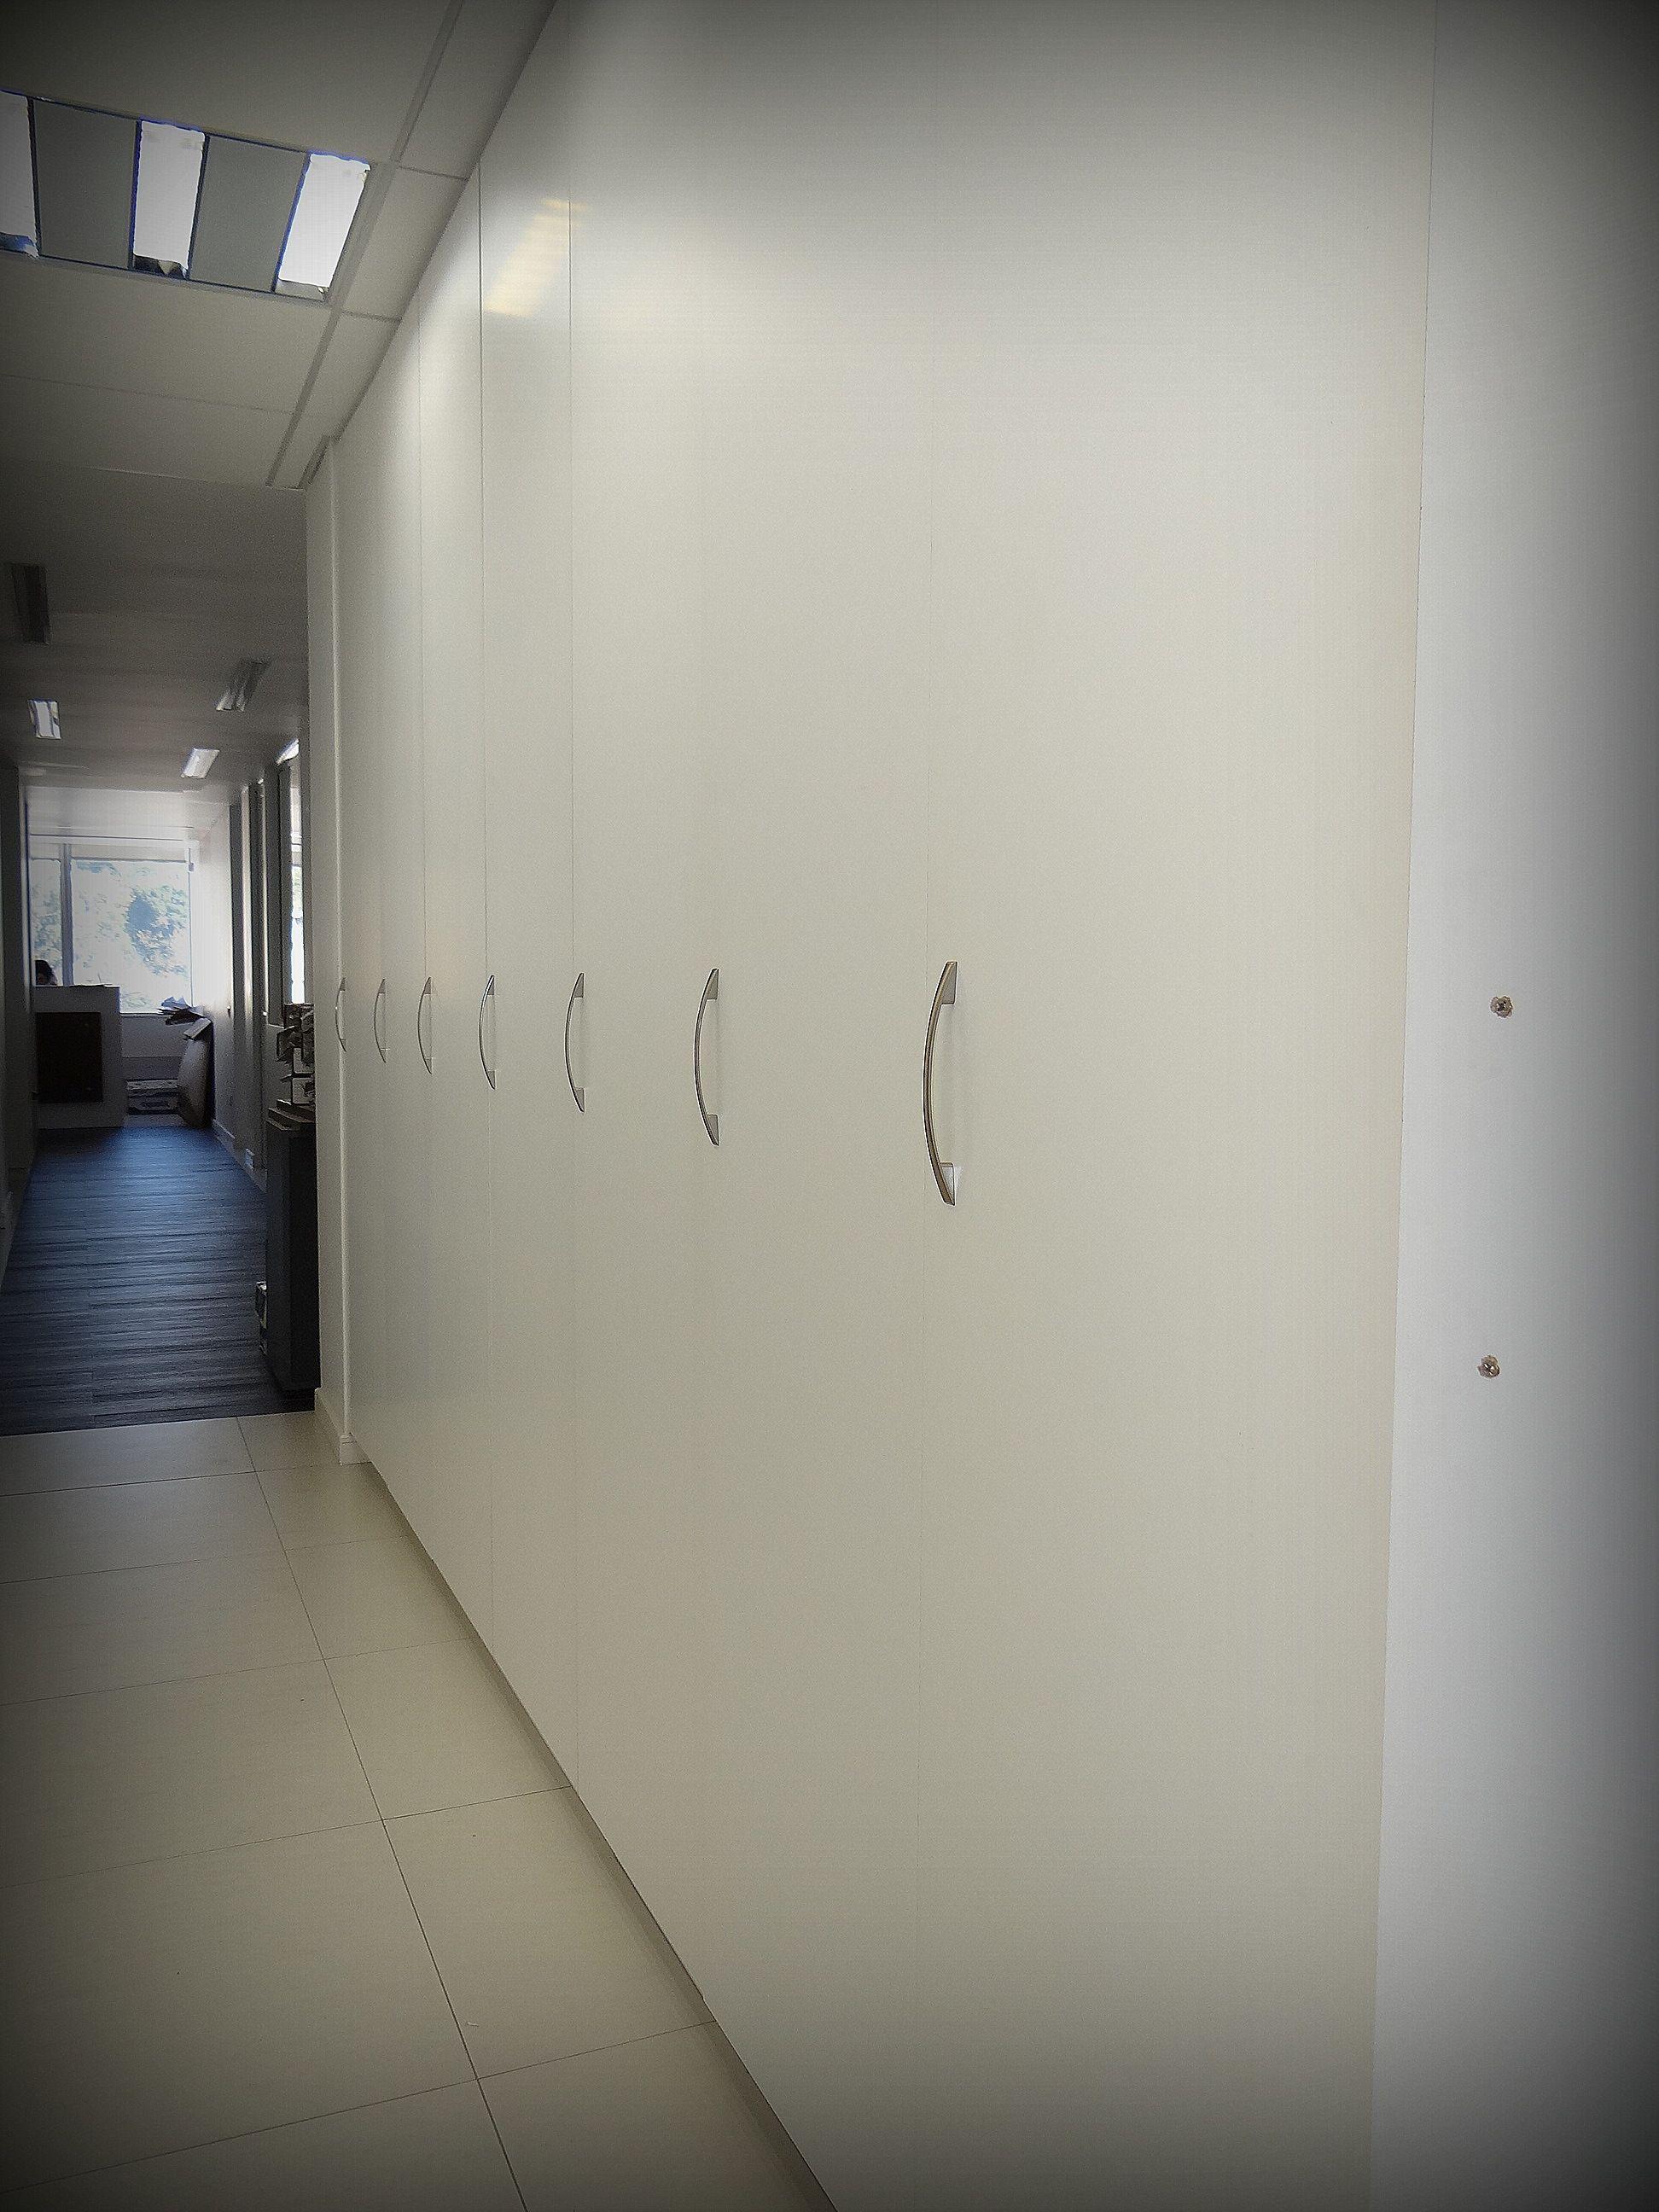 Pasillo closet para guardado general de carpetas puertas - Tiradores de puertas ...